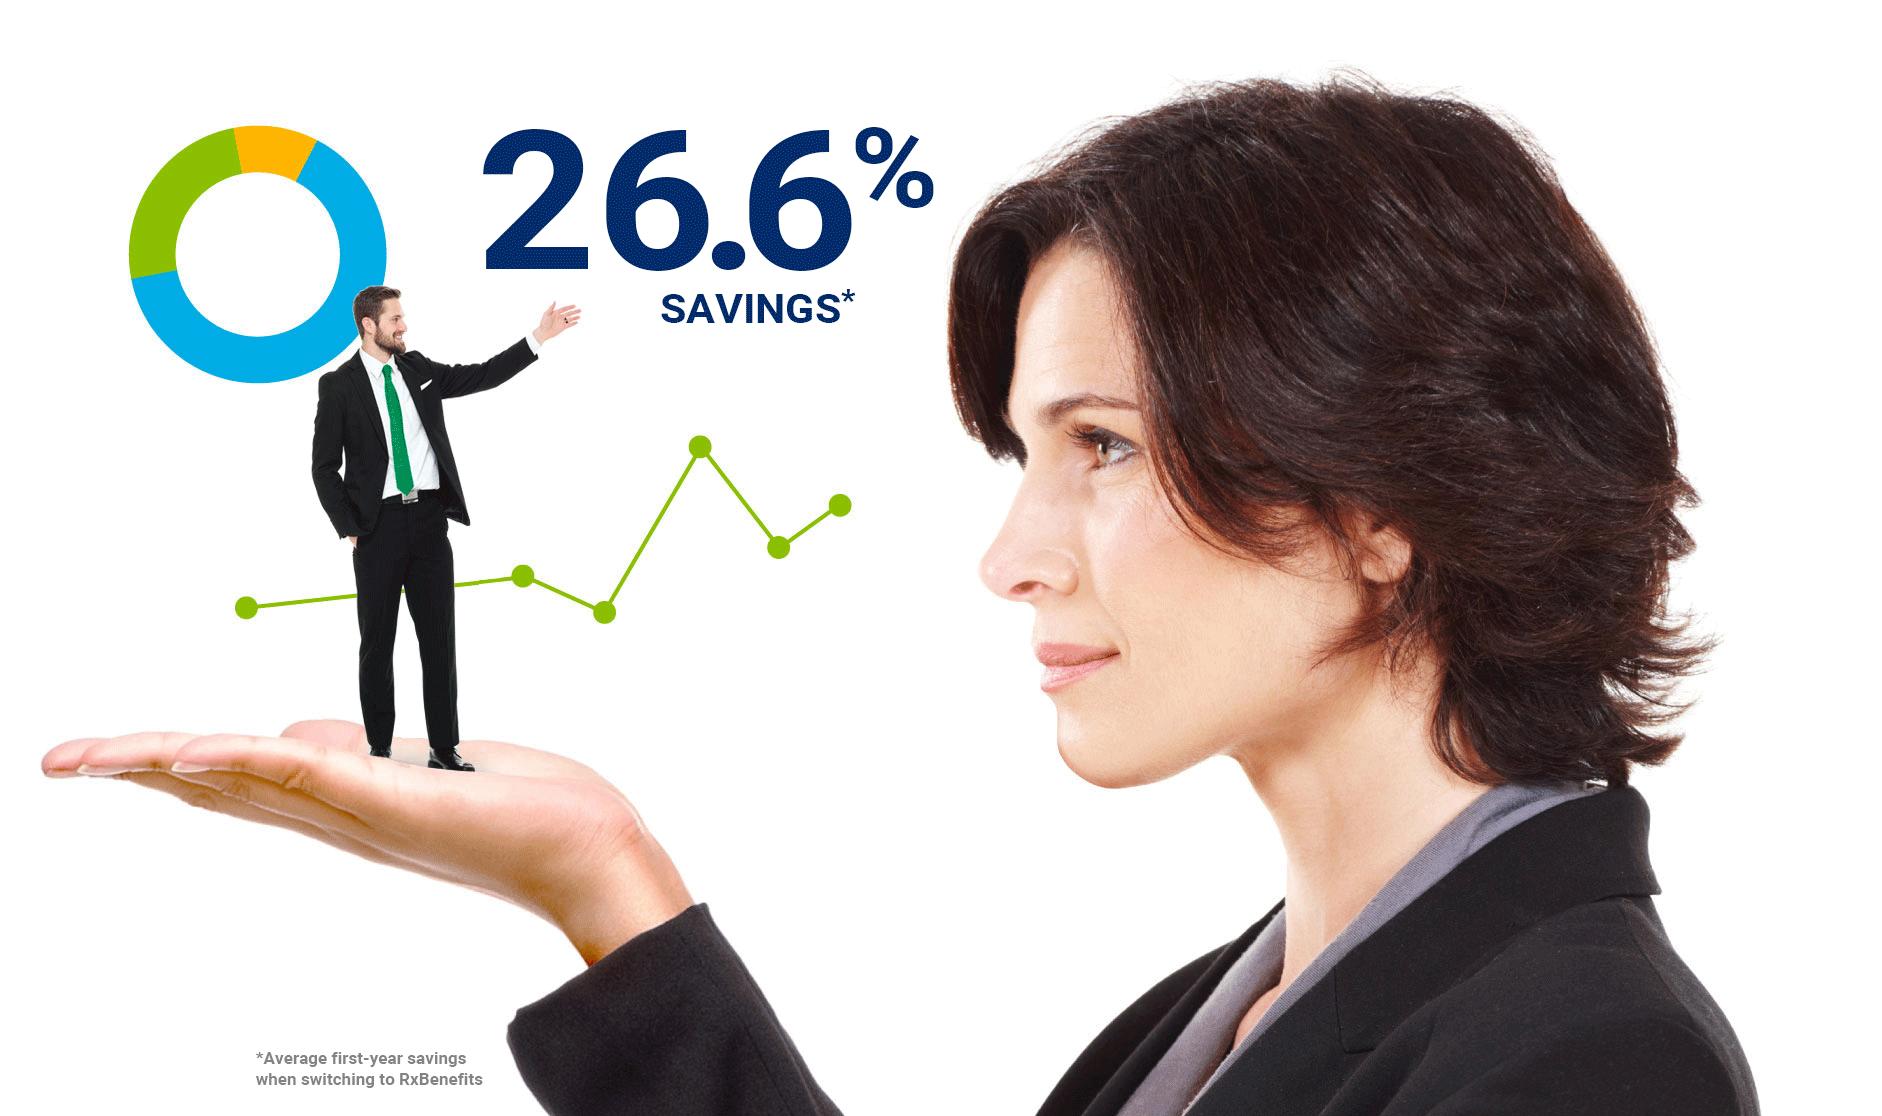 woman and man showing savings percentage